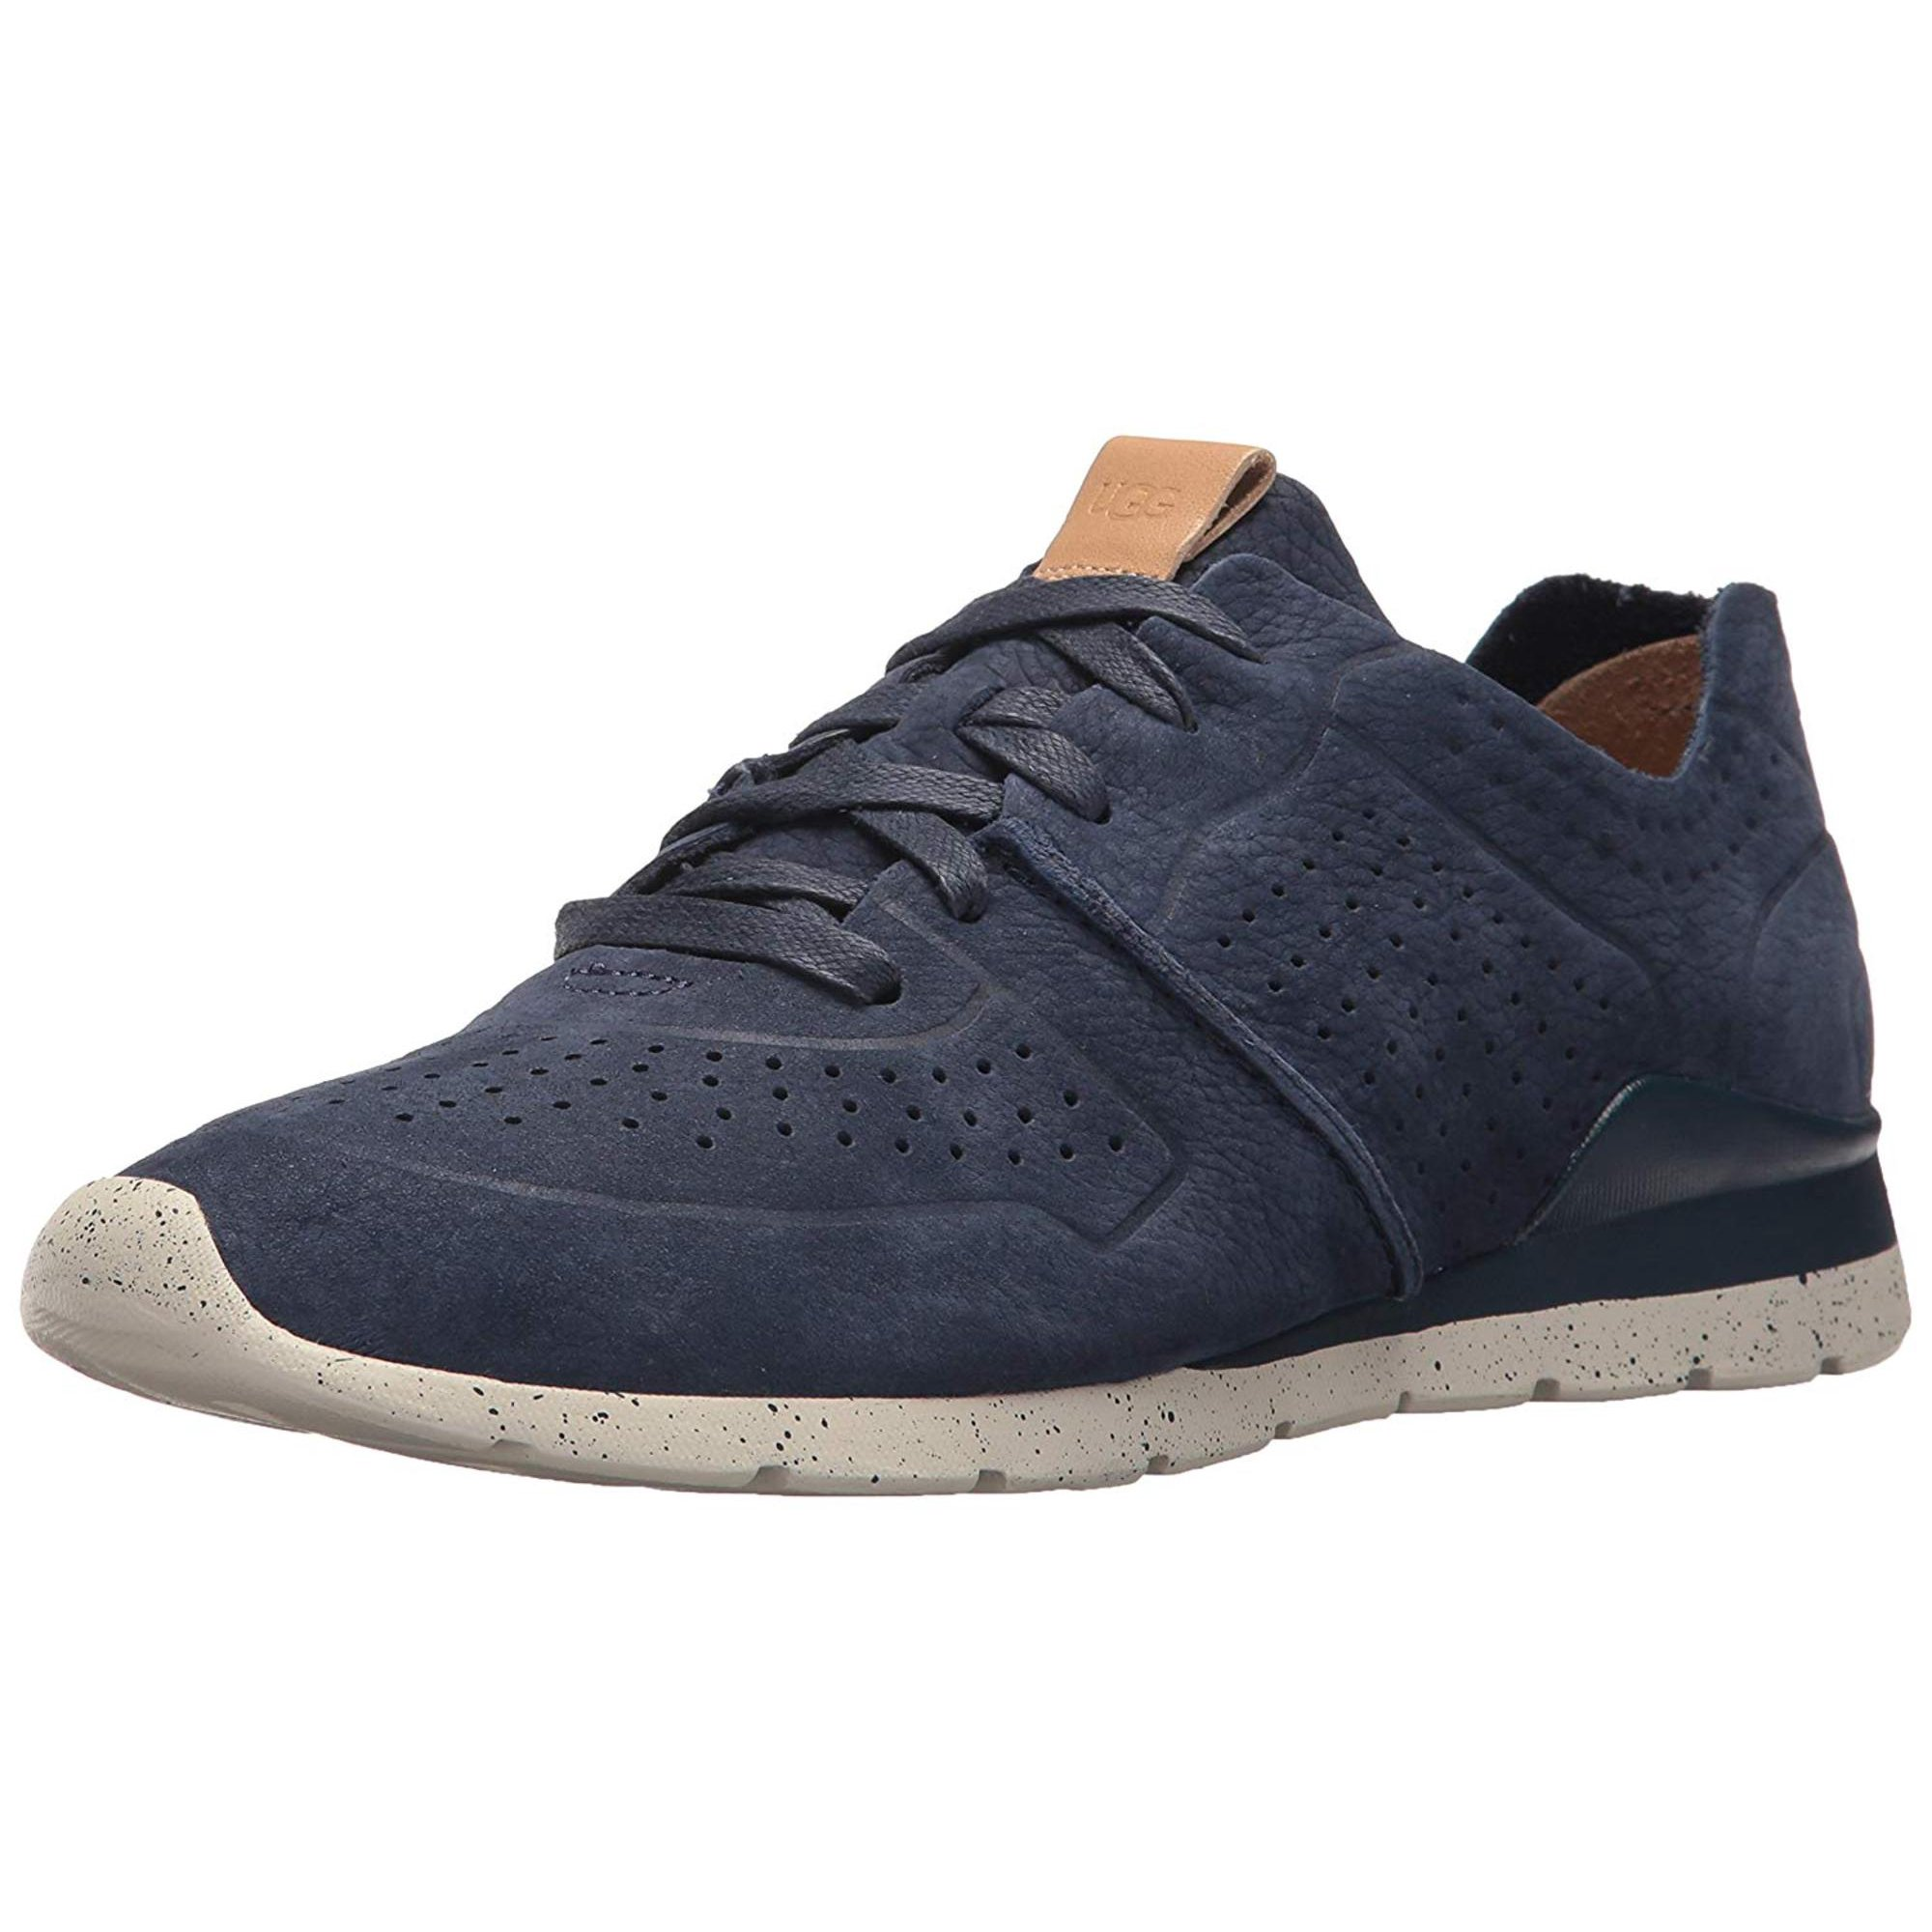 d2978b17553 Ugg Australia Womens tye Low Top Lace Up Fashion Sneakers | Walmart ...